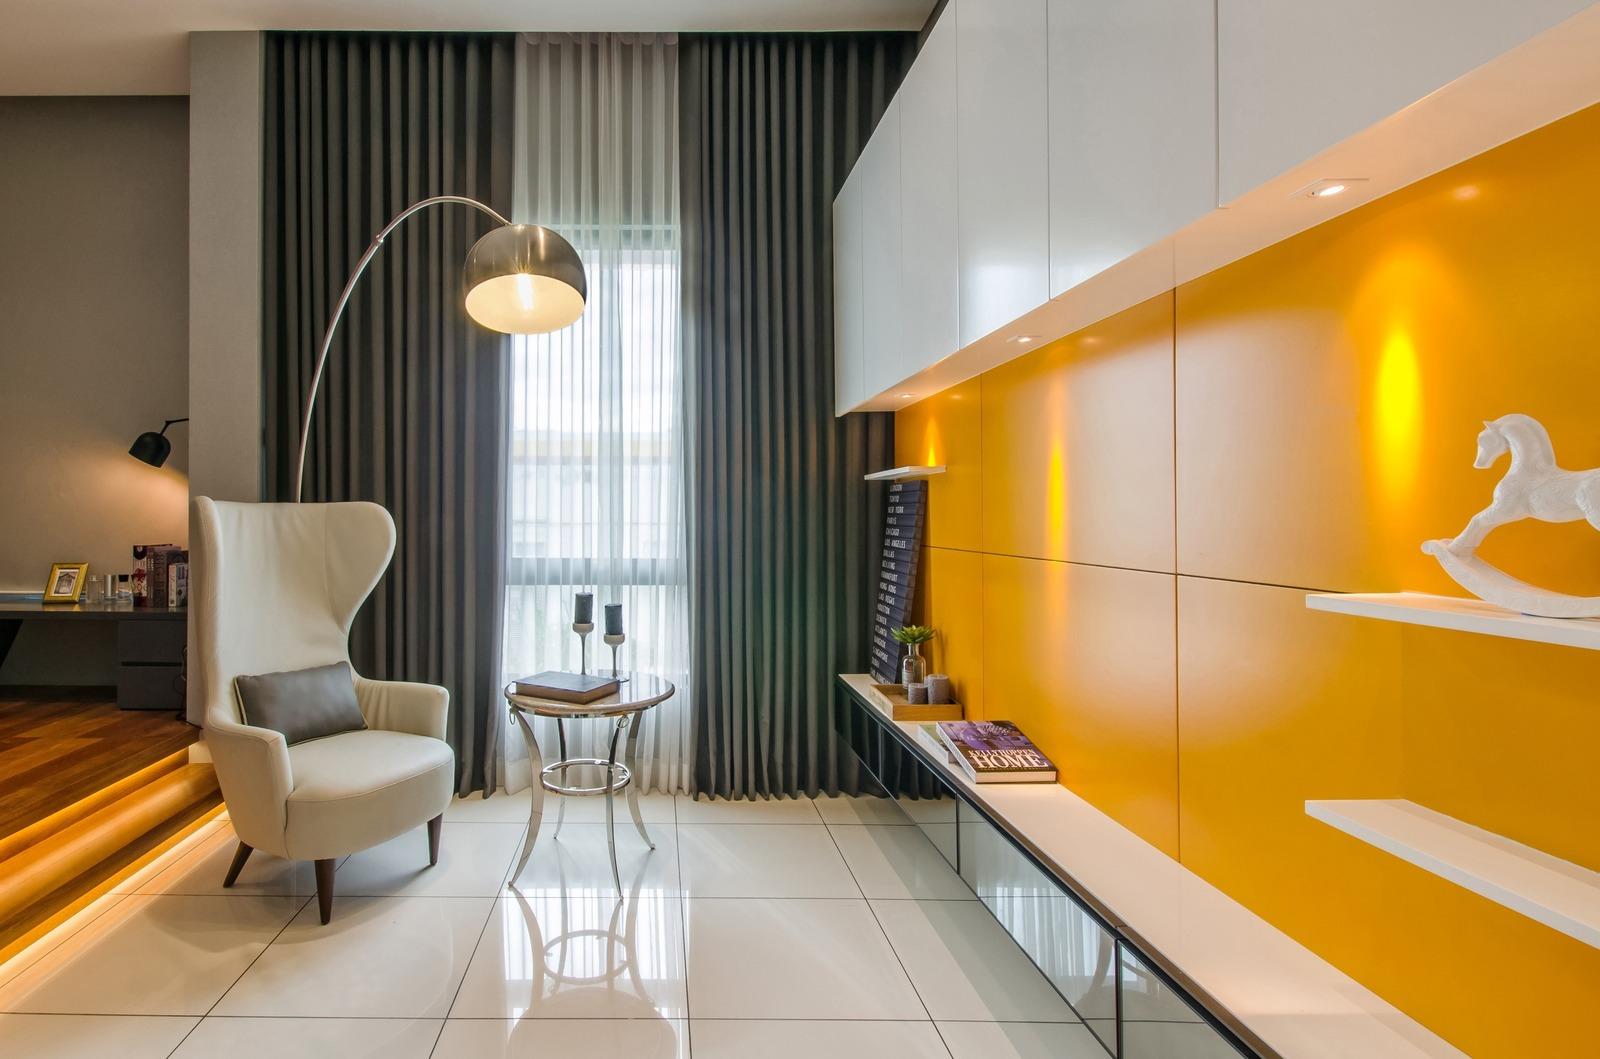 Ancaev Design & Deco Studio (M) S/B | Recommend.my